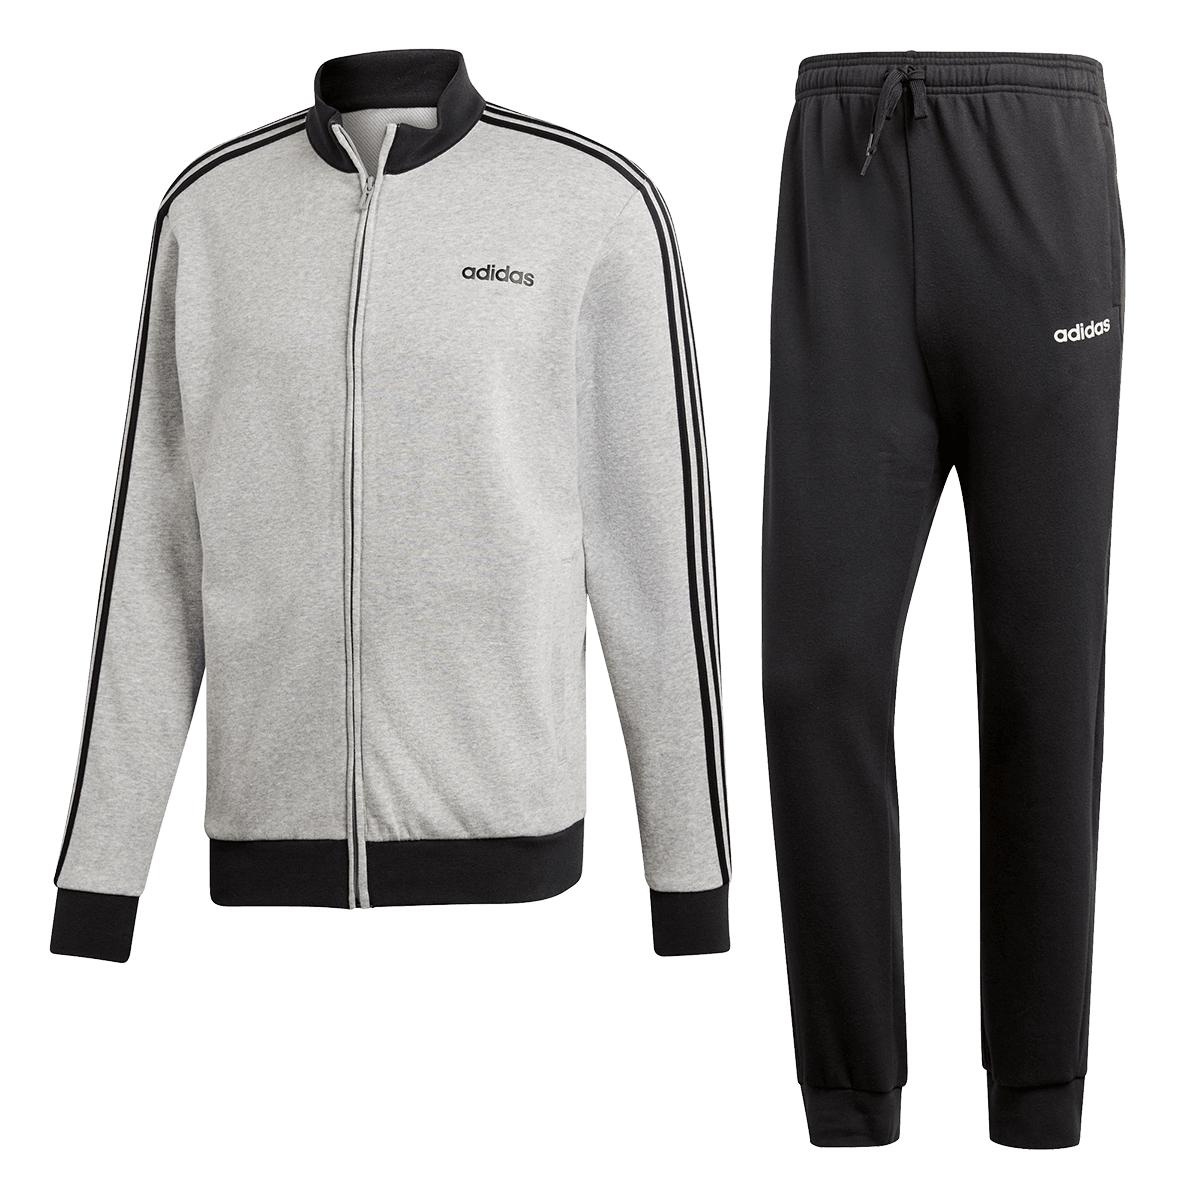 adidas Trainingsanzug MTS Relax in grau/schwarz (Gr. S -XXL) für 44,95€